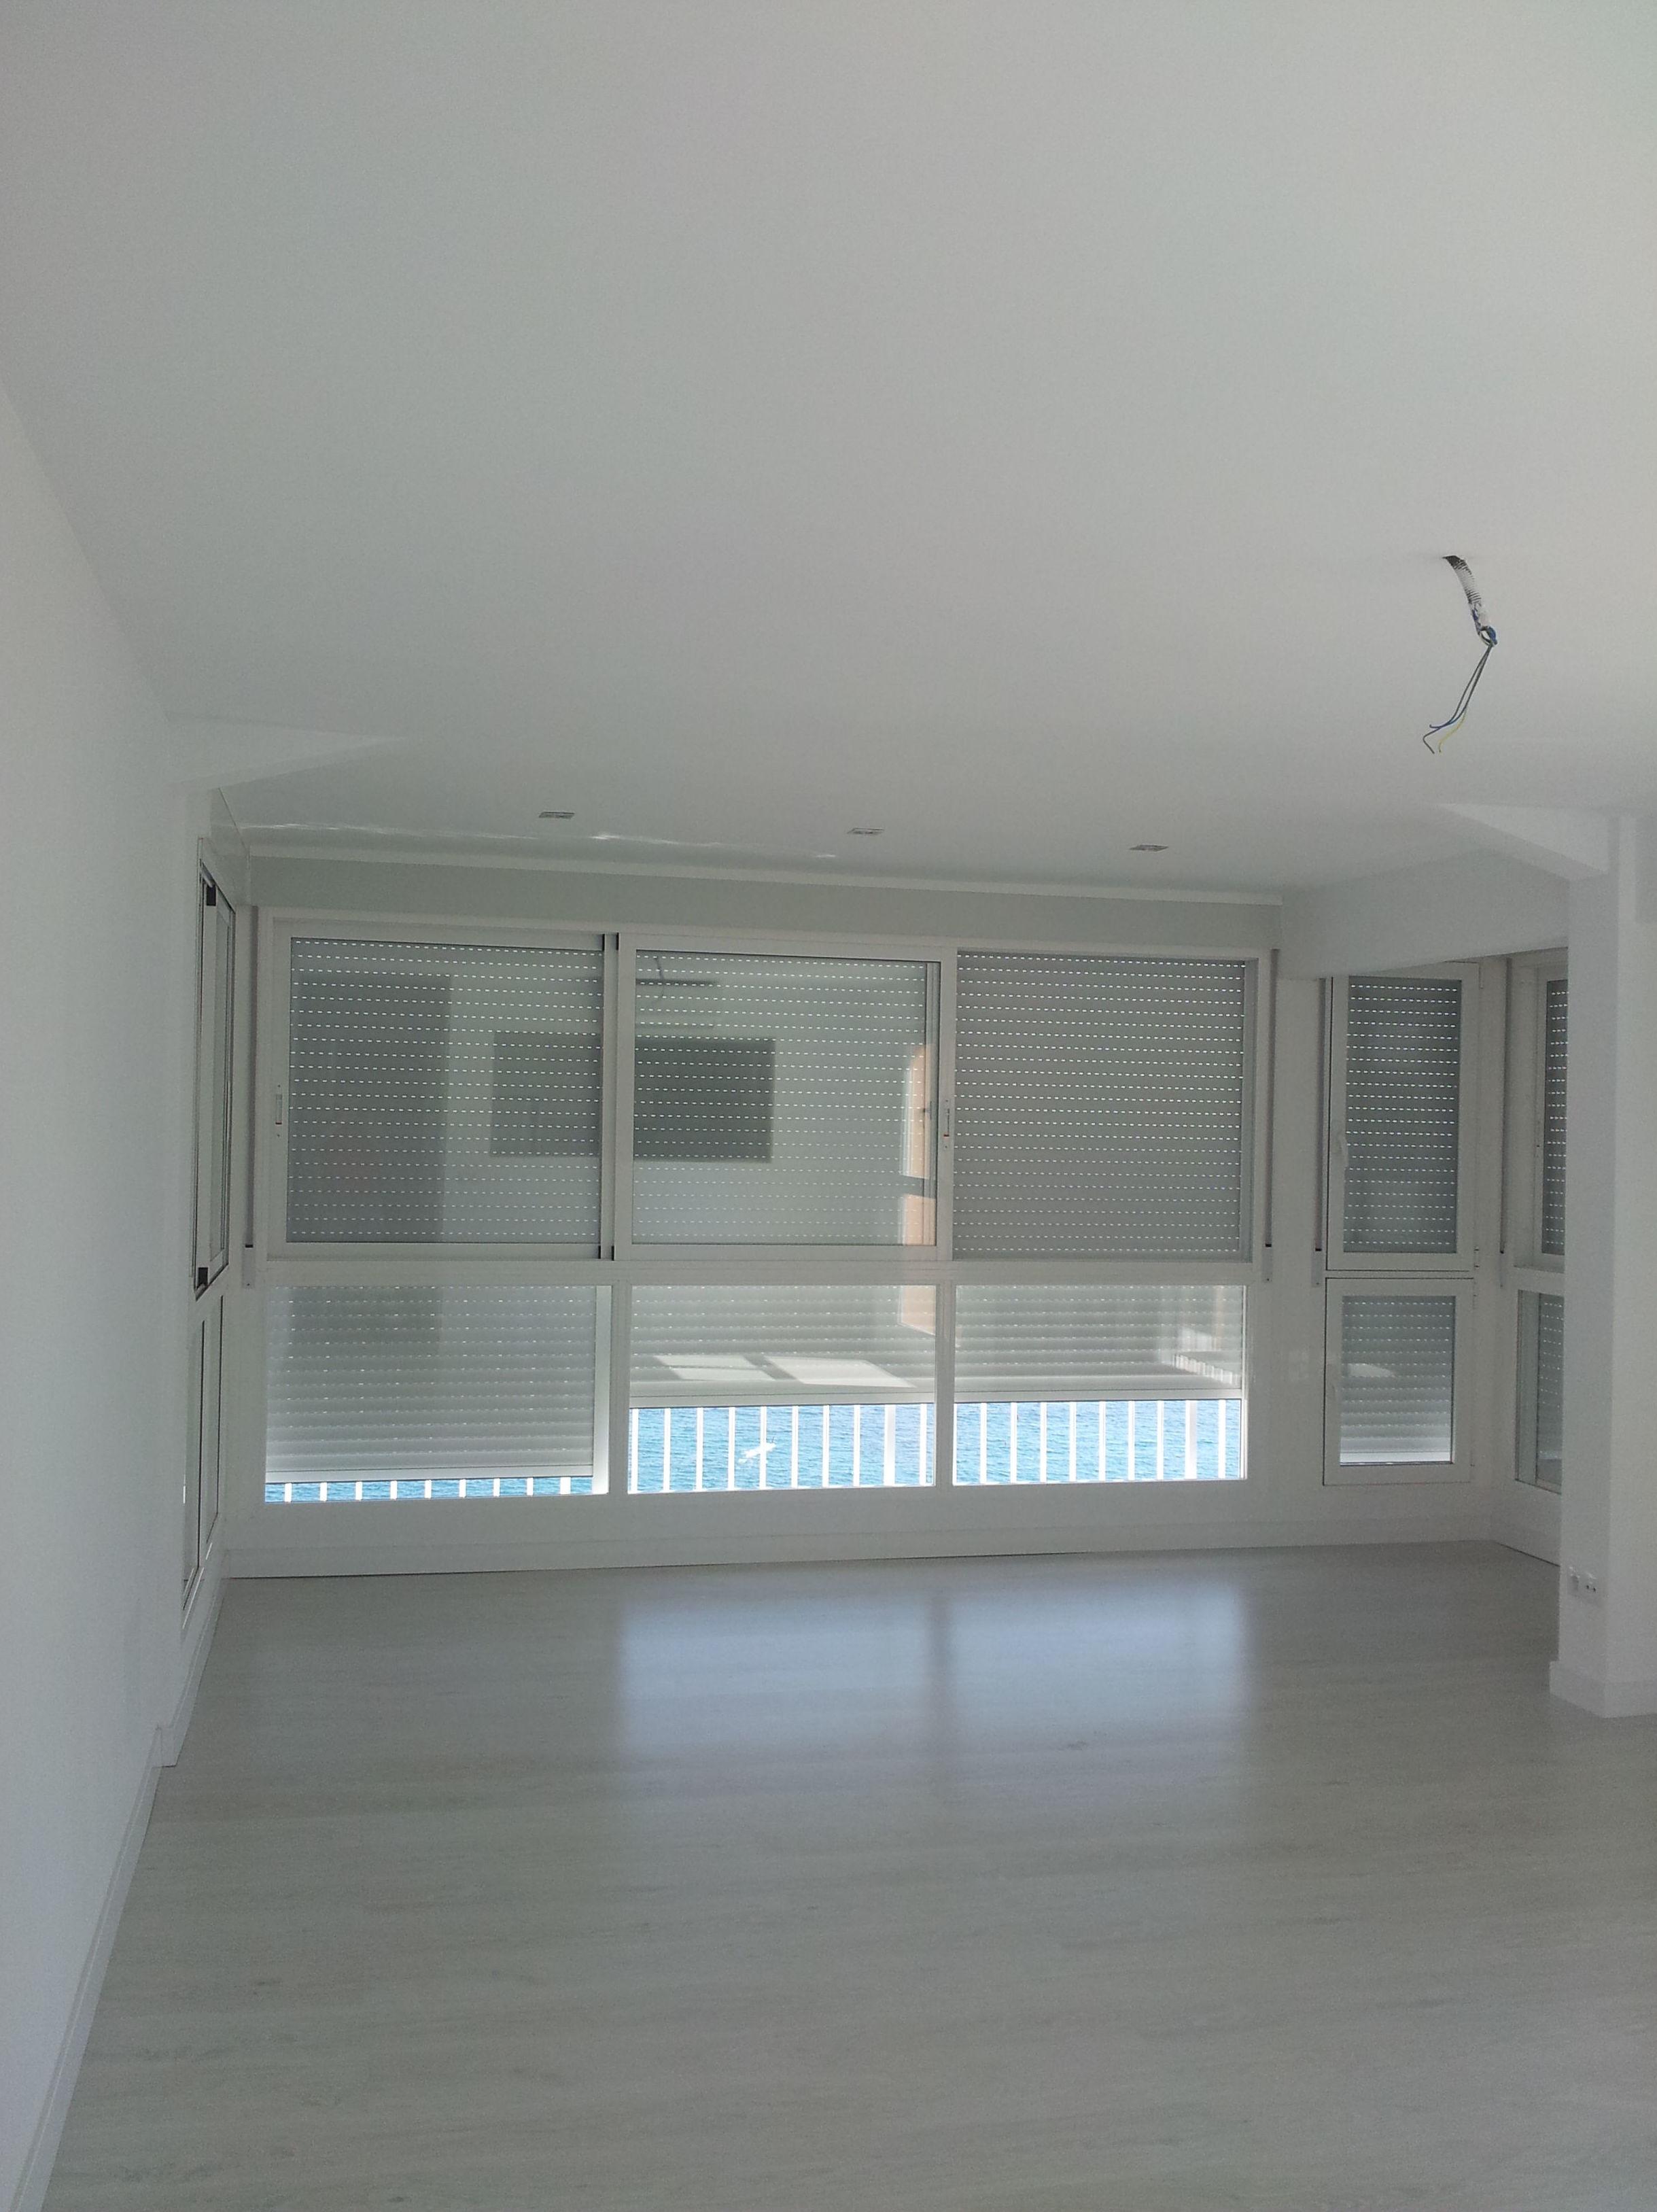 Reformas en viviendas